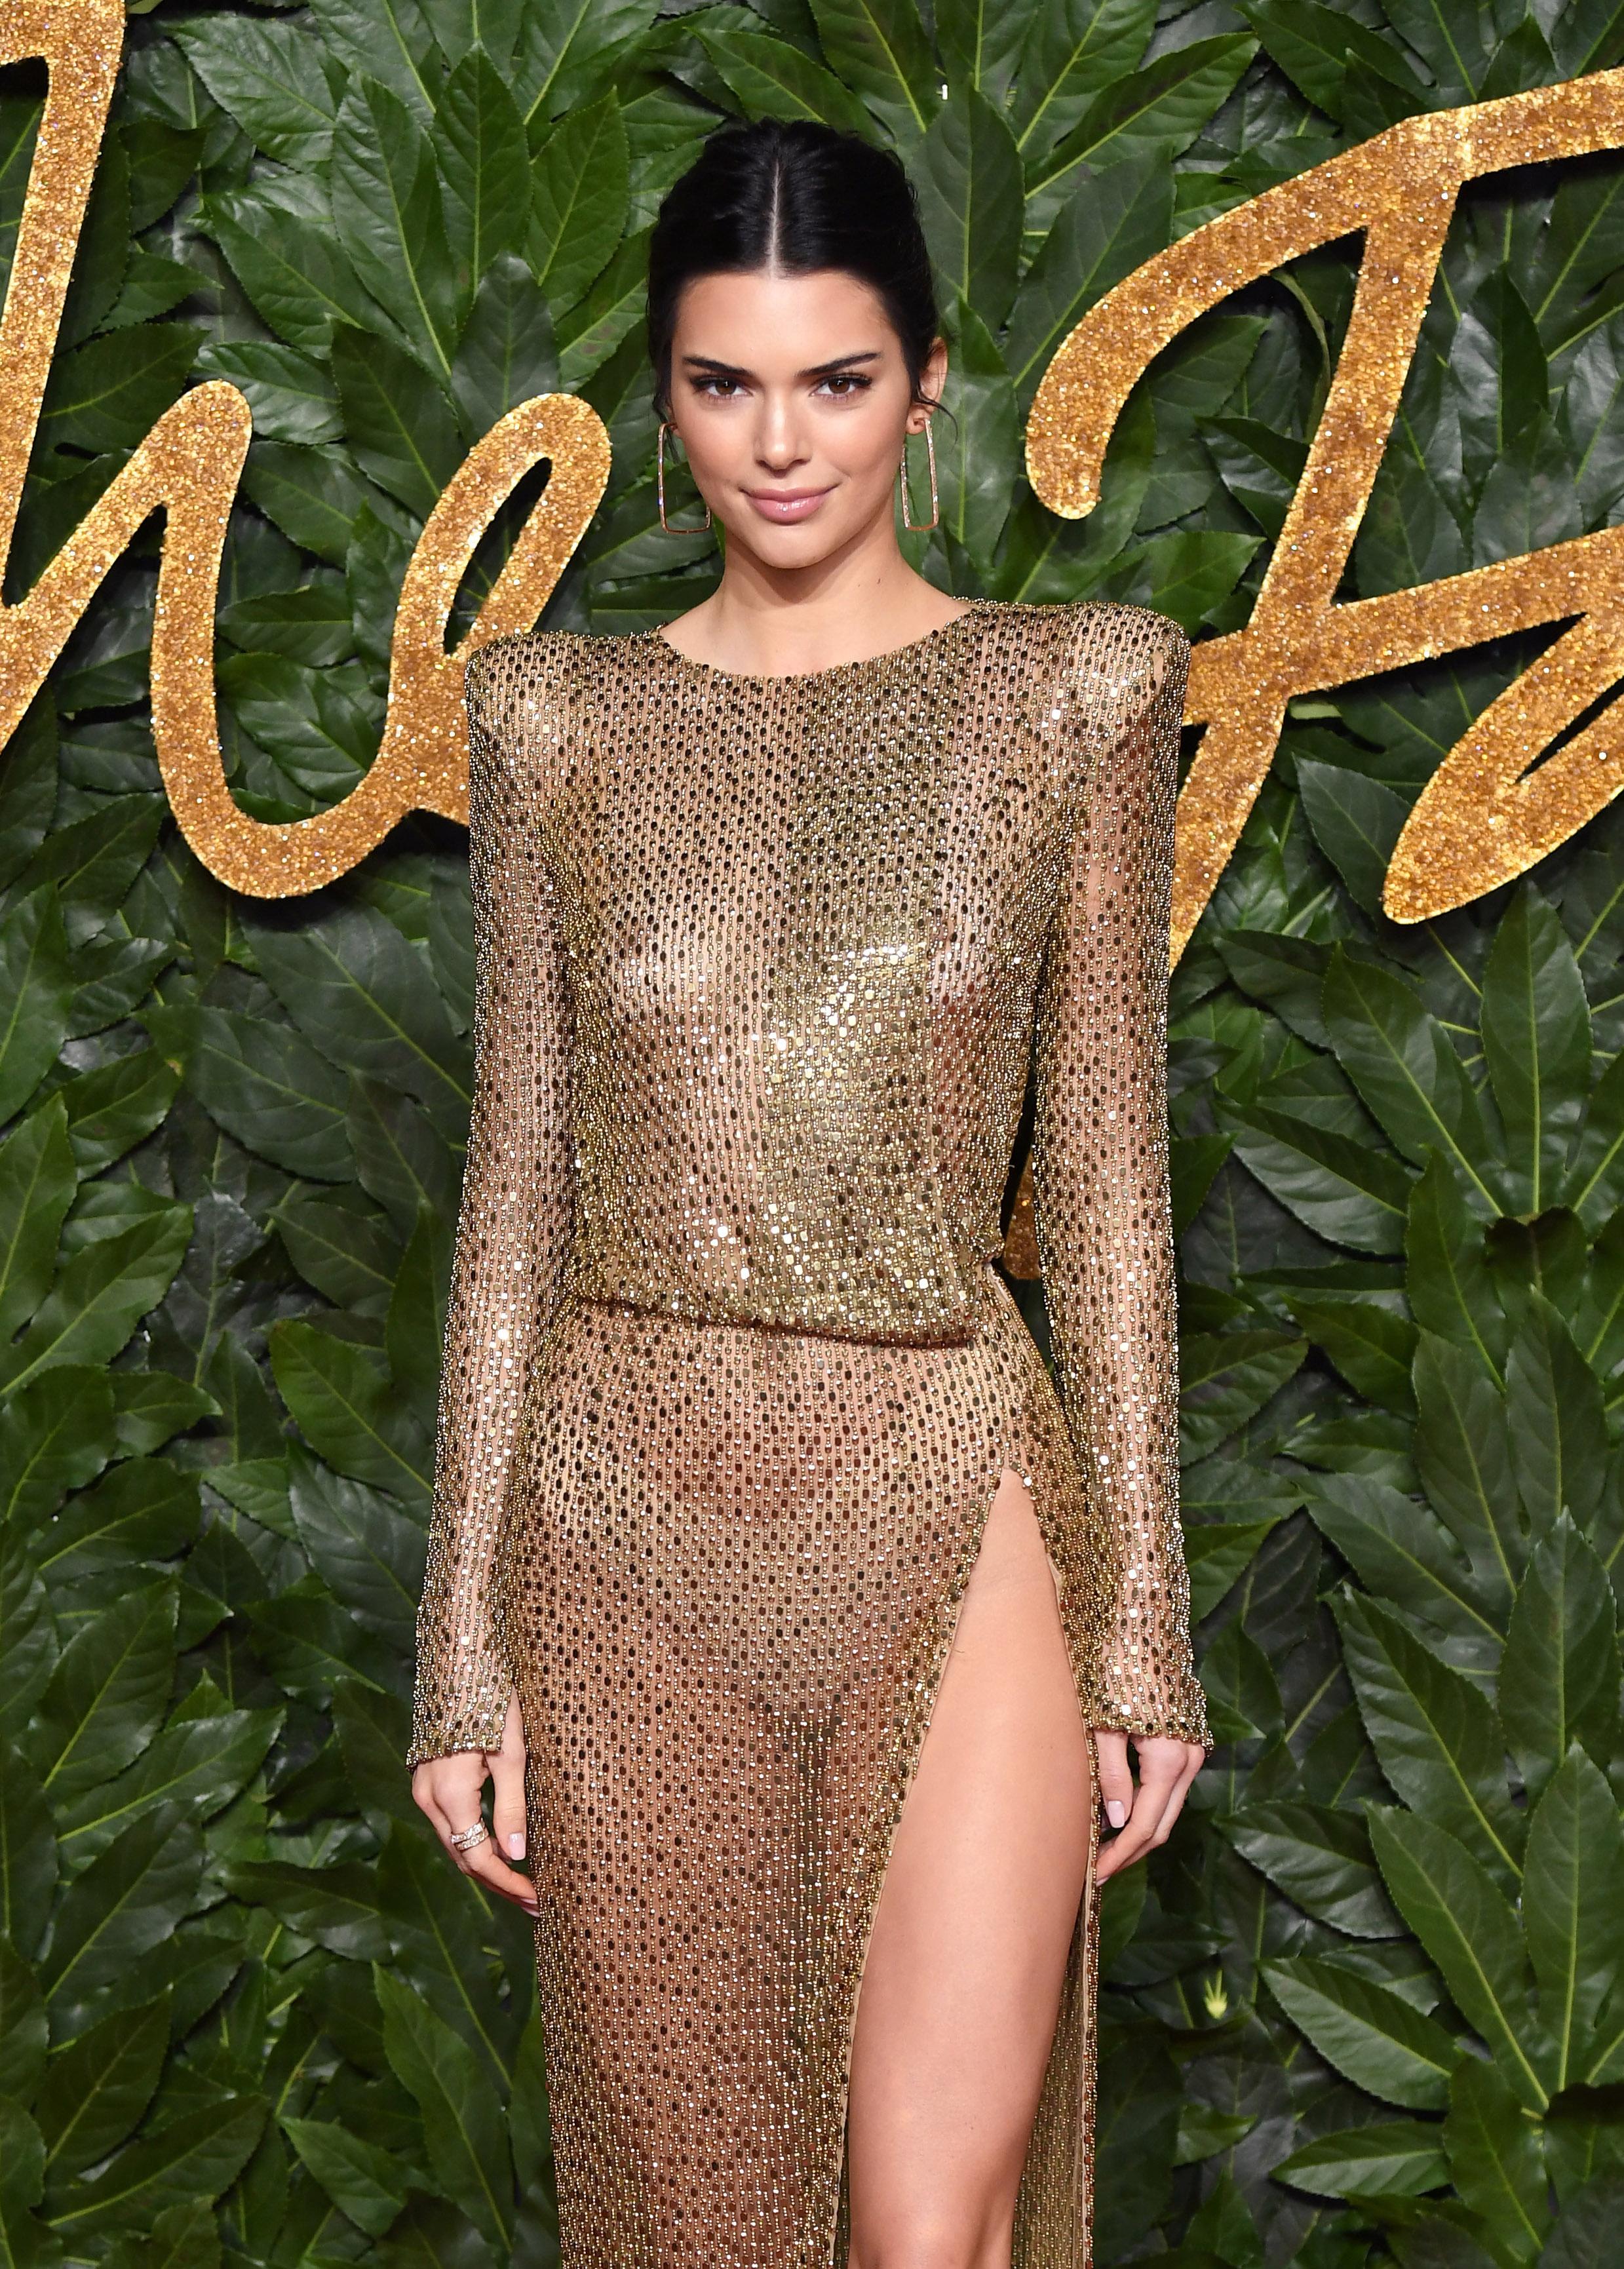 Kendall Jenner, famosa, estilo, modelo